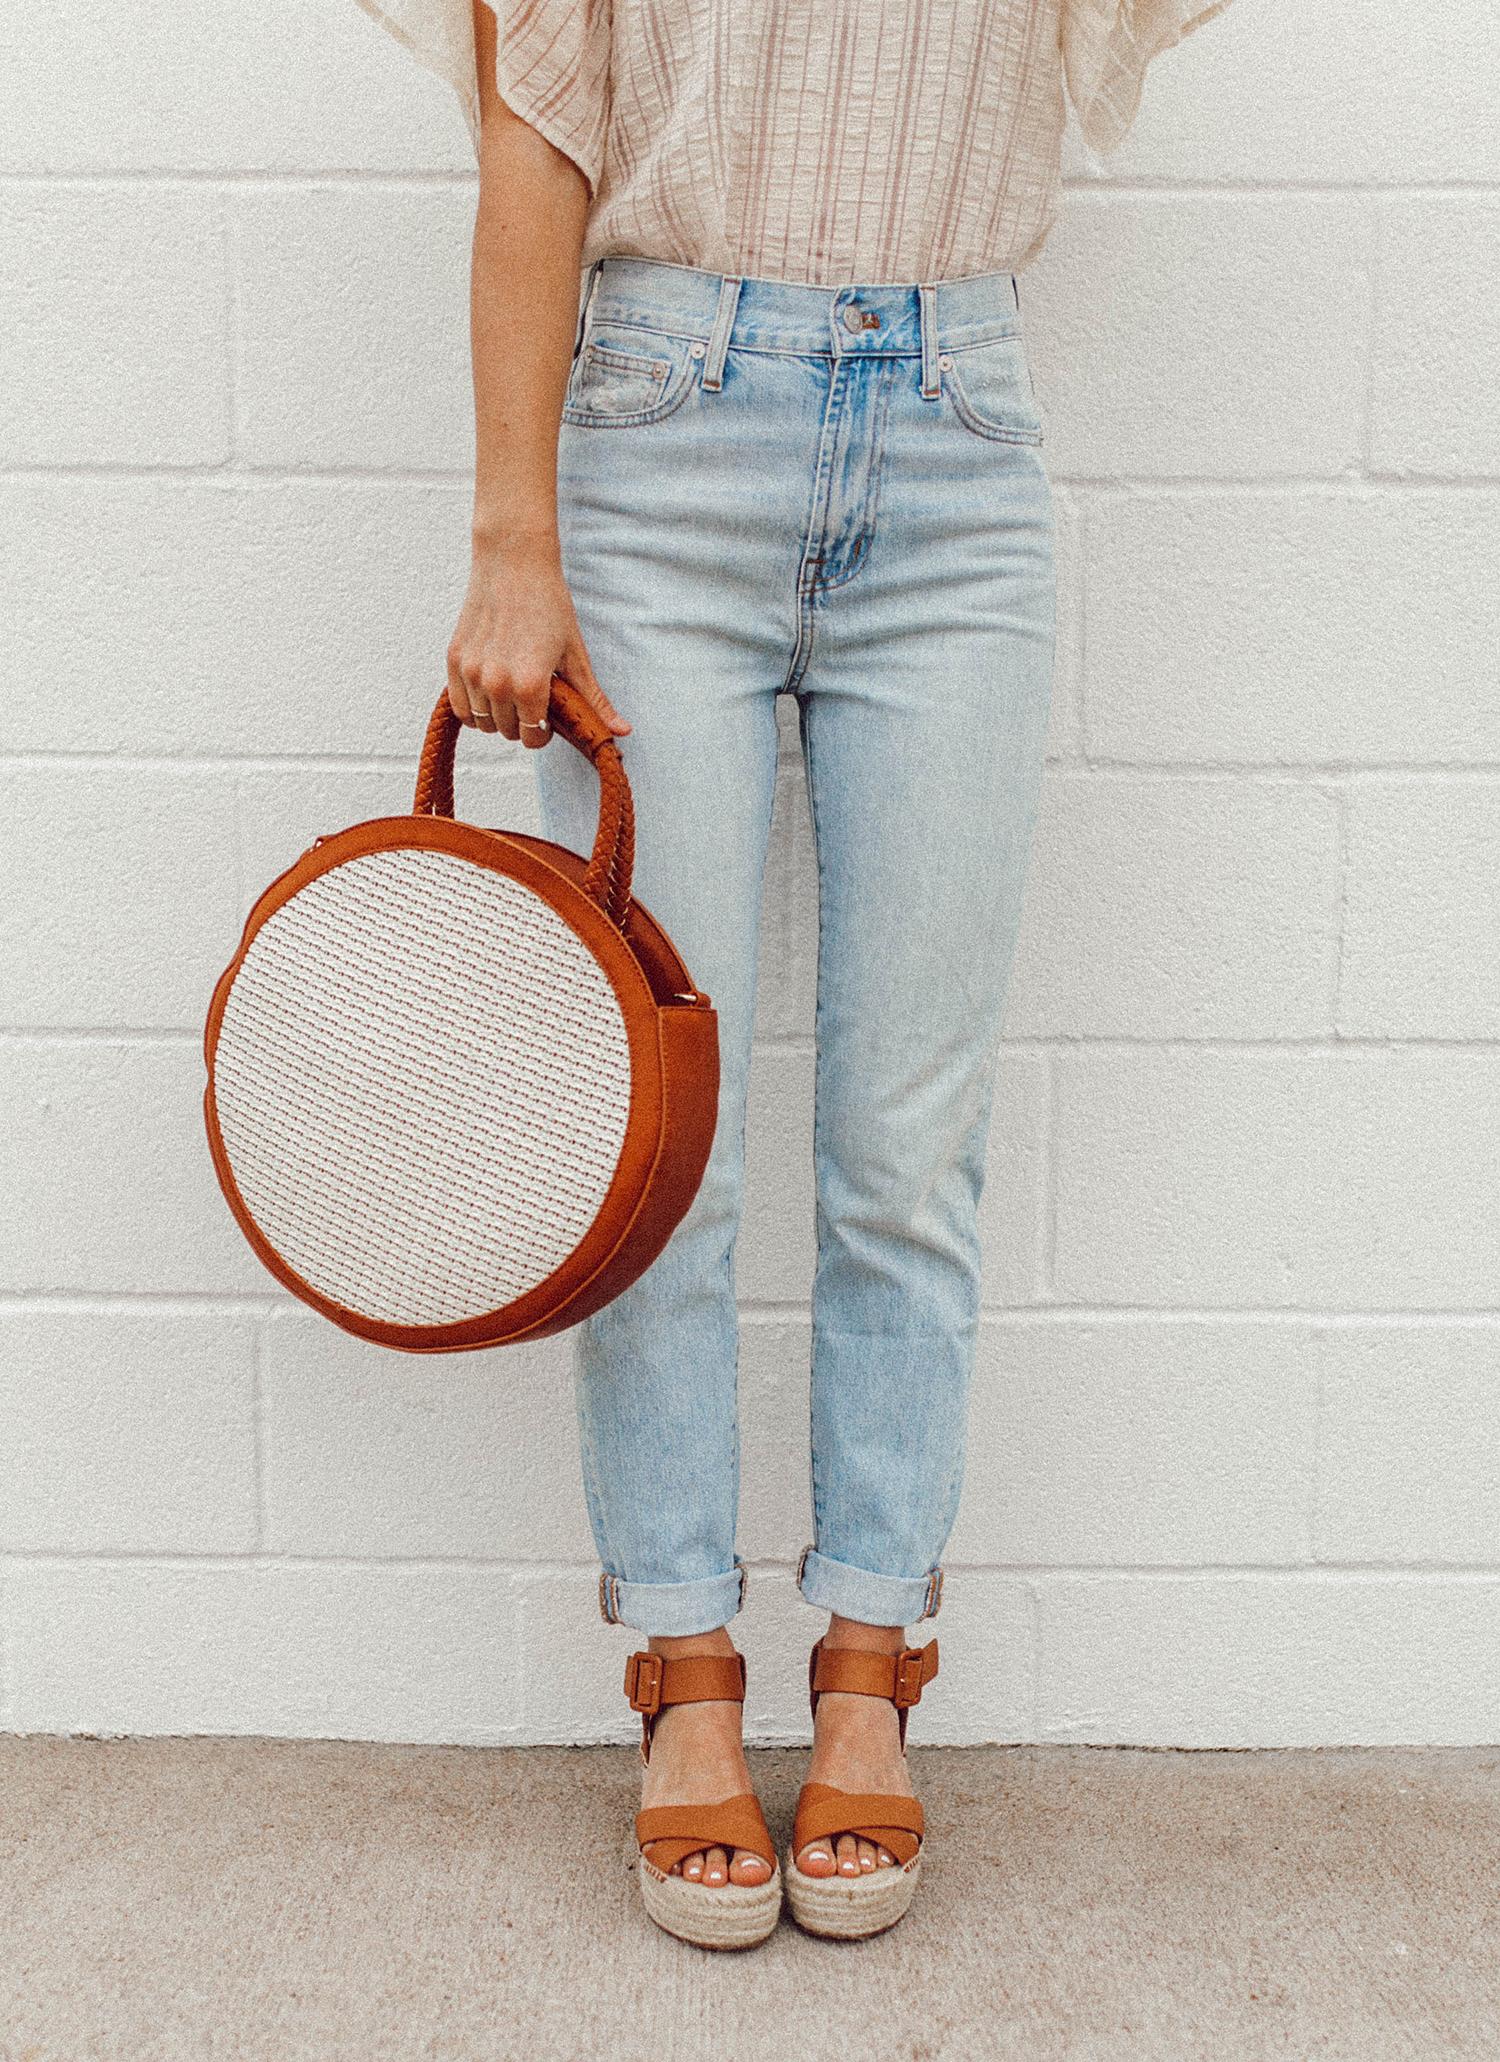 livvyland-blog-olivia-watson-sole-society-espadrille-wedges-round-straw-handbag-7